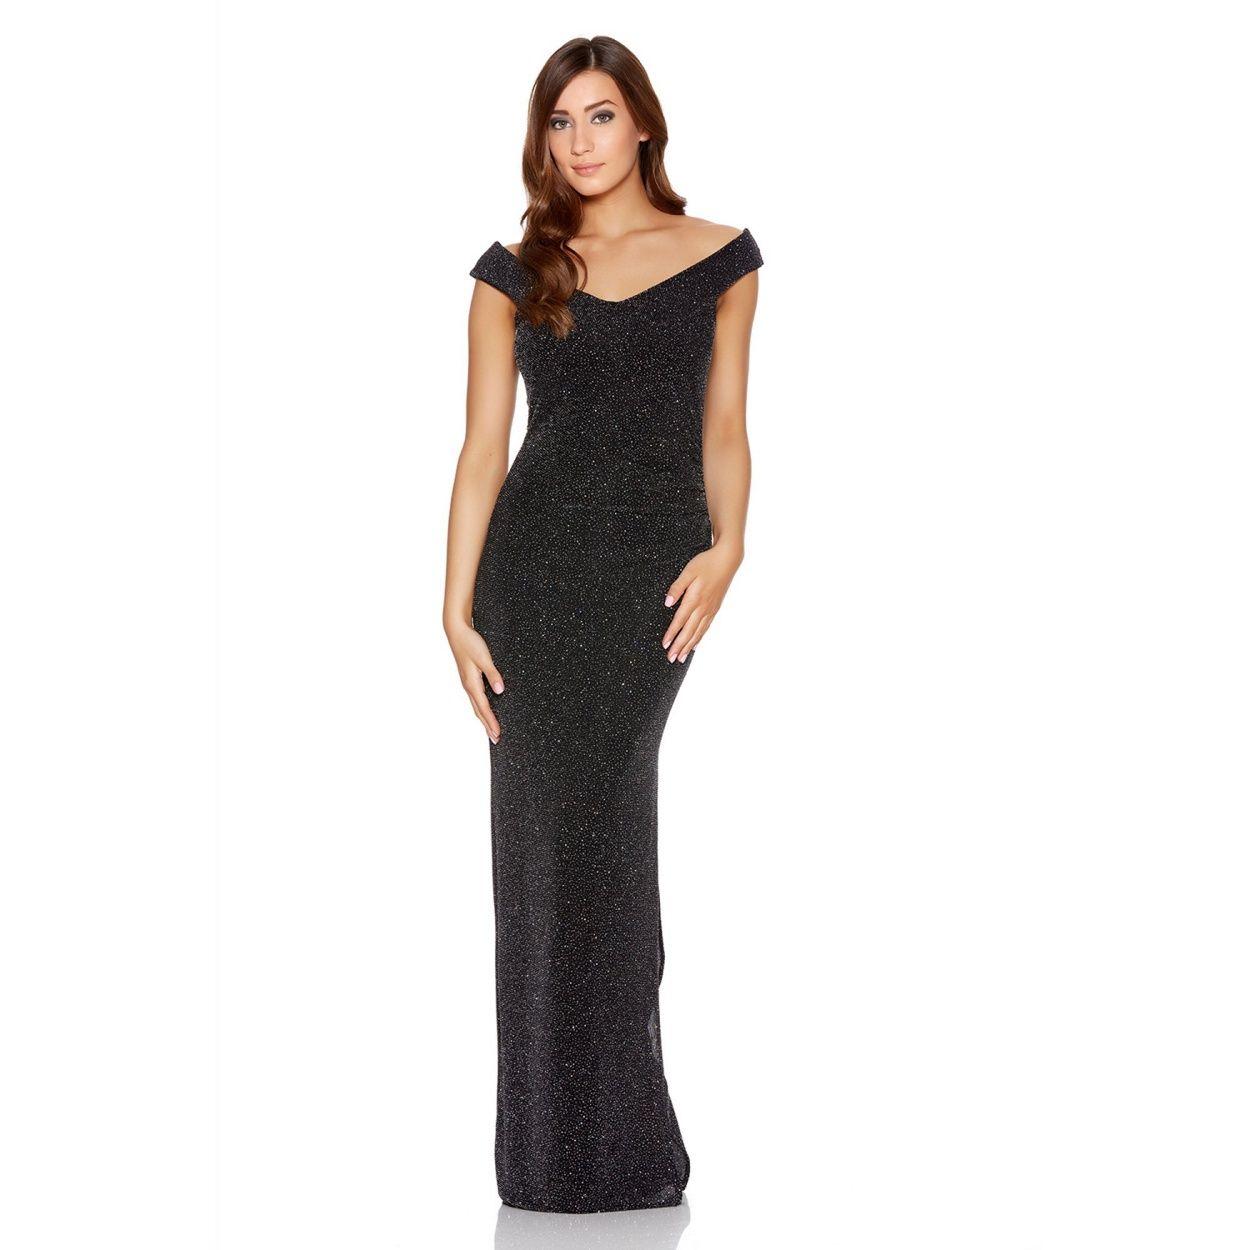 Black dress debenhams - Quiz Black Brillo Side Split Bardot Maxi Dress